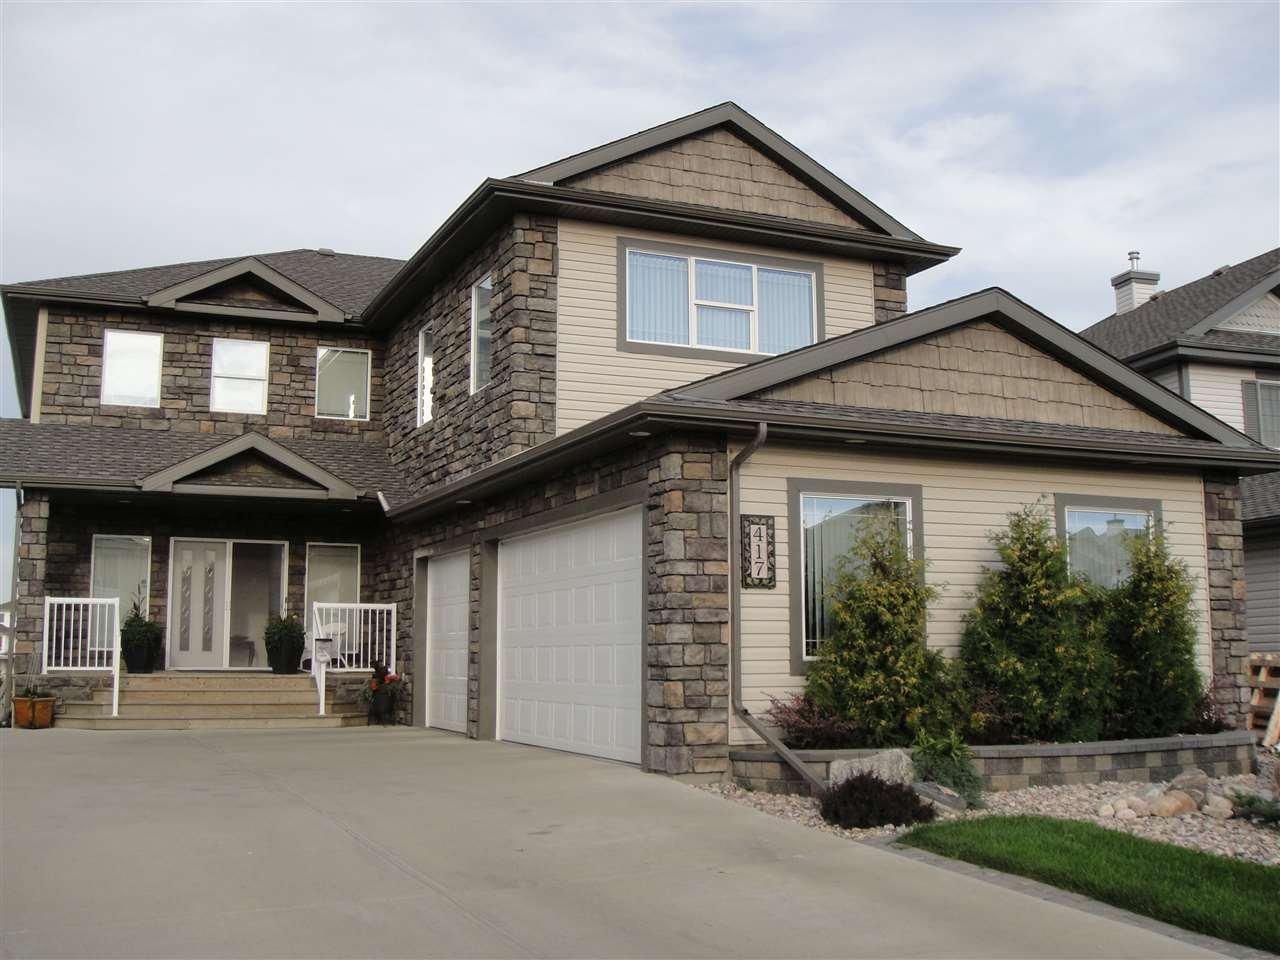 Main Photo: 417 CALDERON Crescent in Edmonton: Zone 27 House for sale : MLS®# E4204802